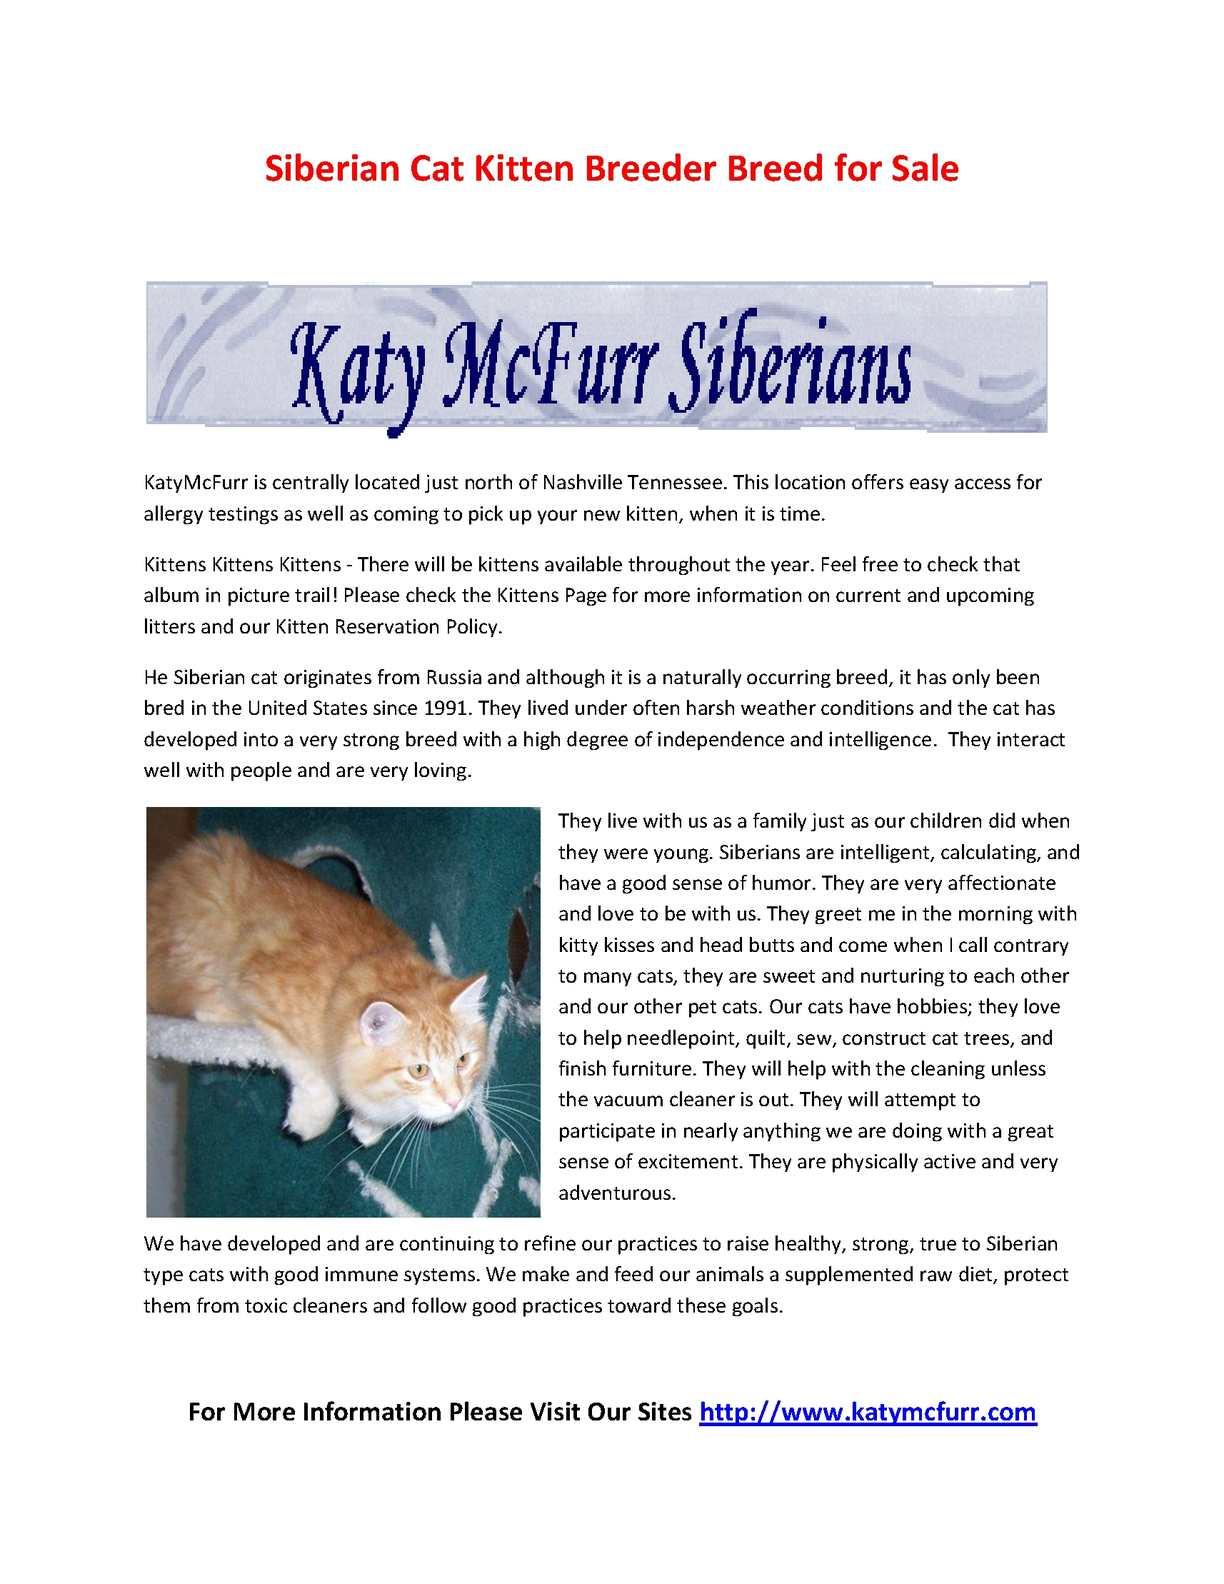 Calameo Siberian Cat Kitten Breeder Breed For Sale